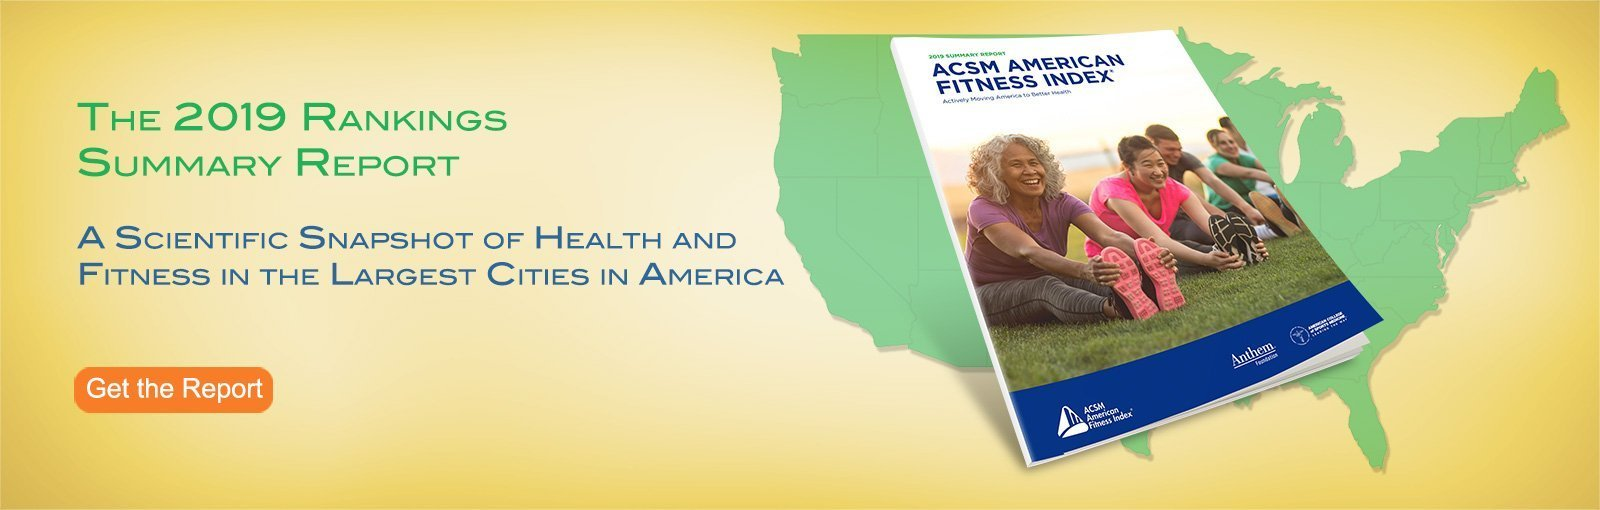 acsm-american-fitness-index-2019-rankings-summary-reportl